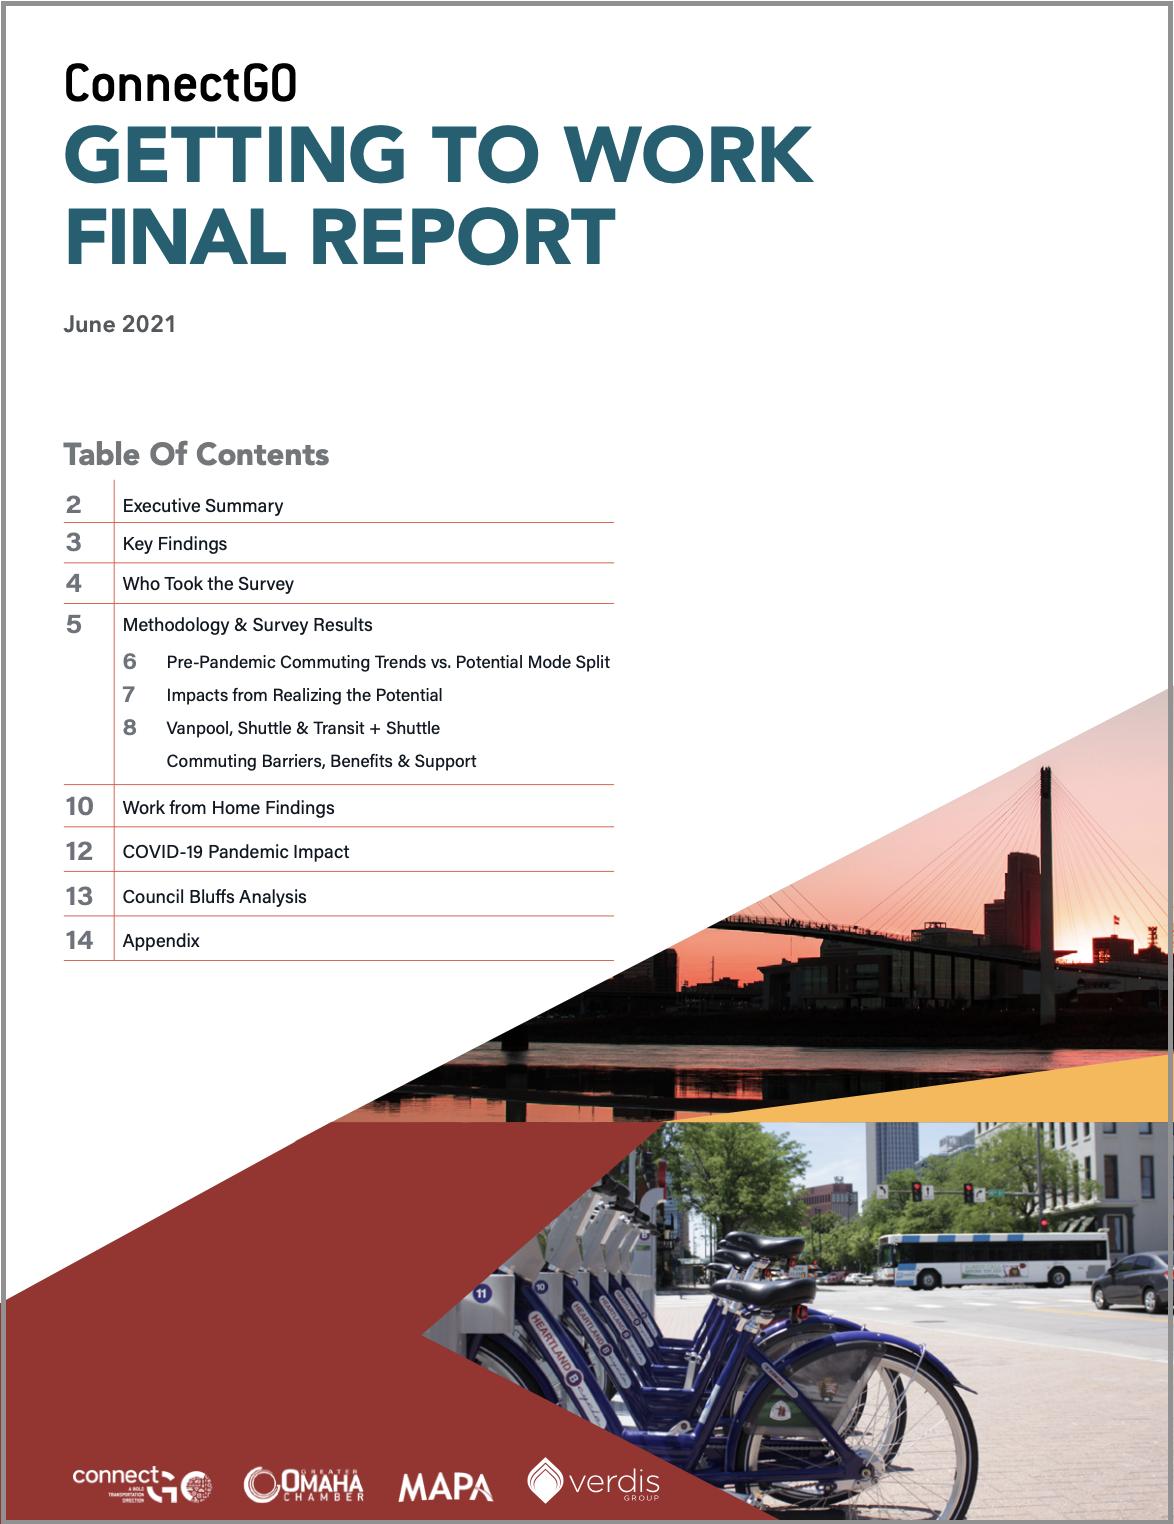 Verdis Group Report for ConnectGO